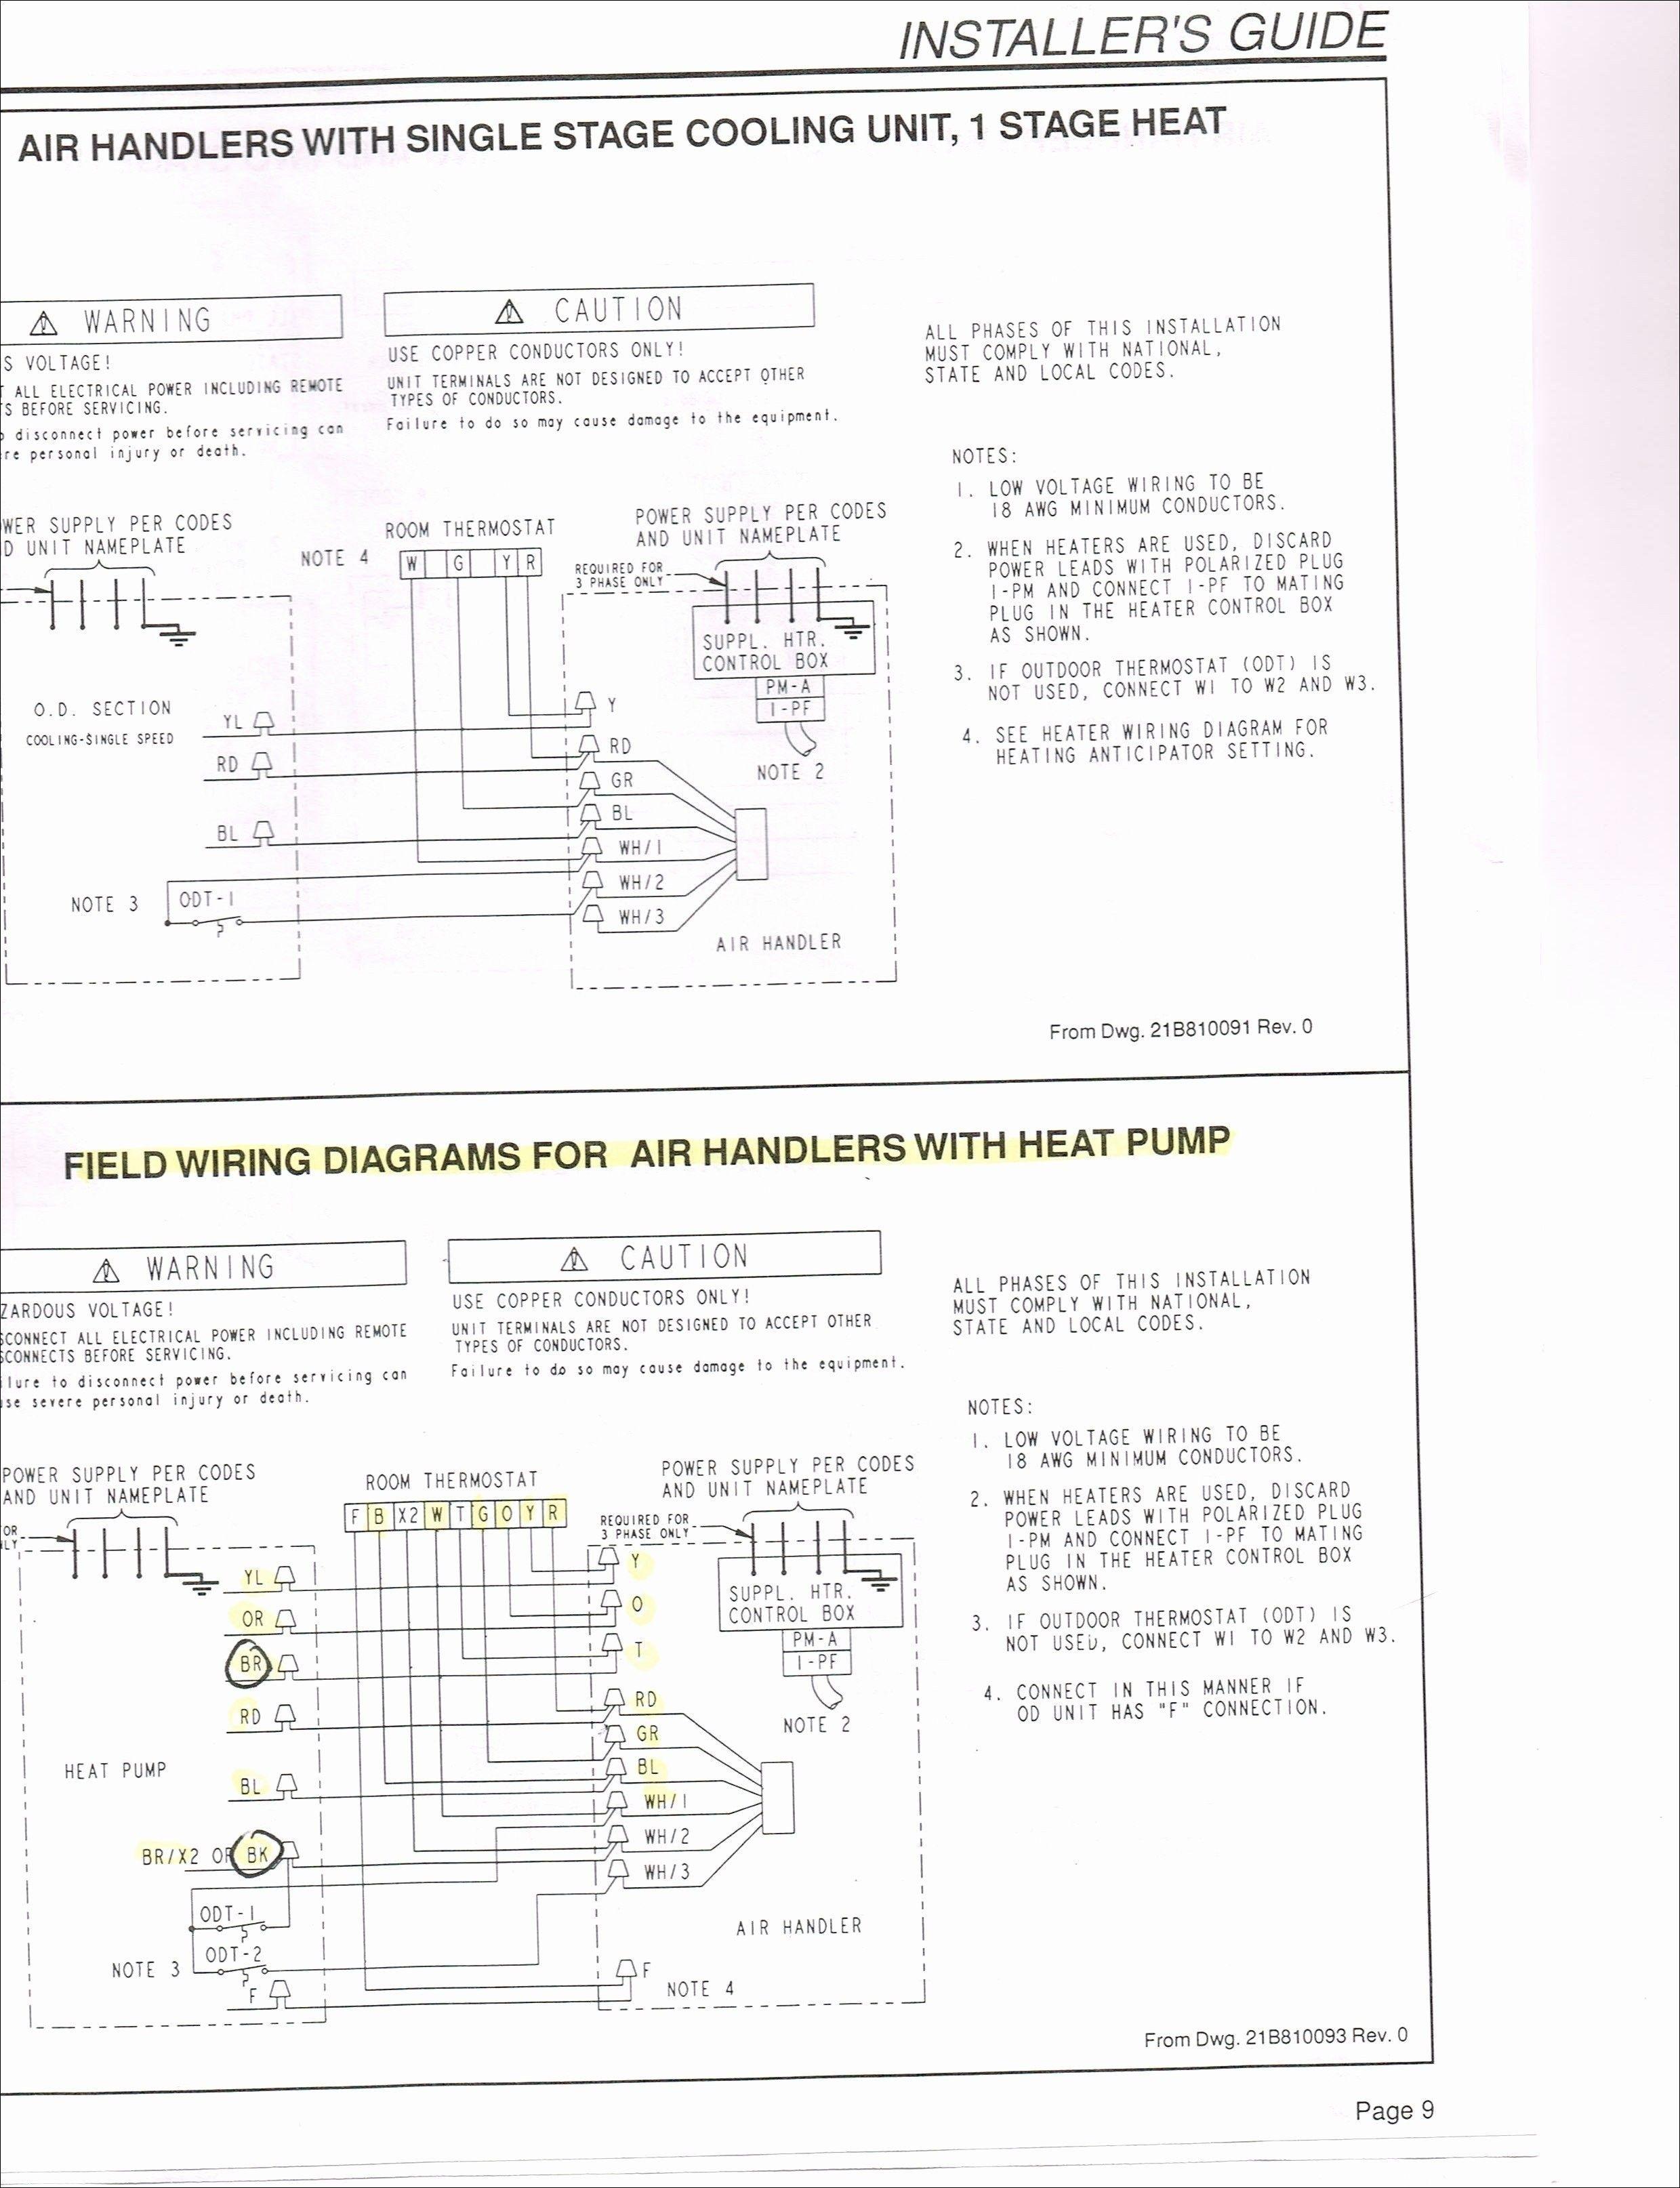 1999 Dodge Ram 1500 Trailer Wiring Diagram from i.pinimg.com